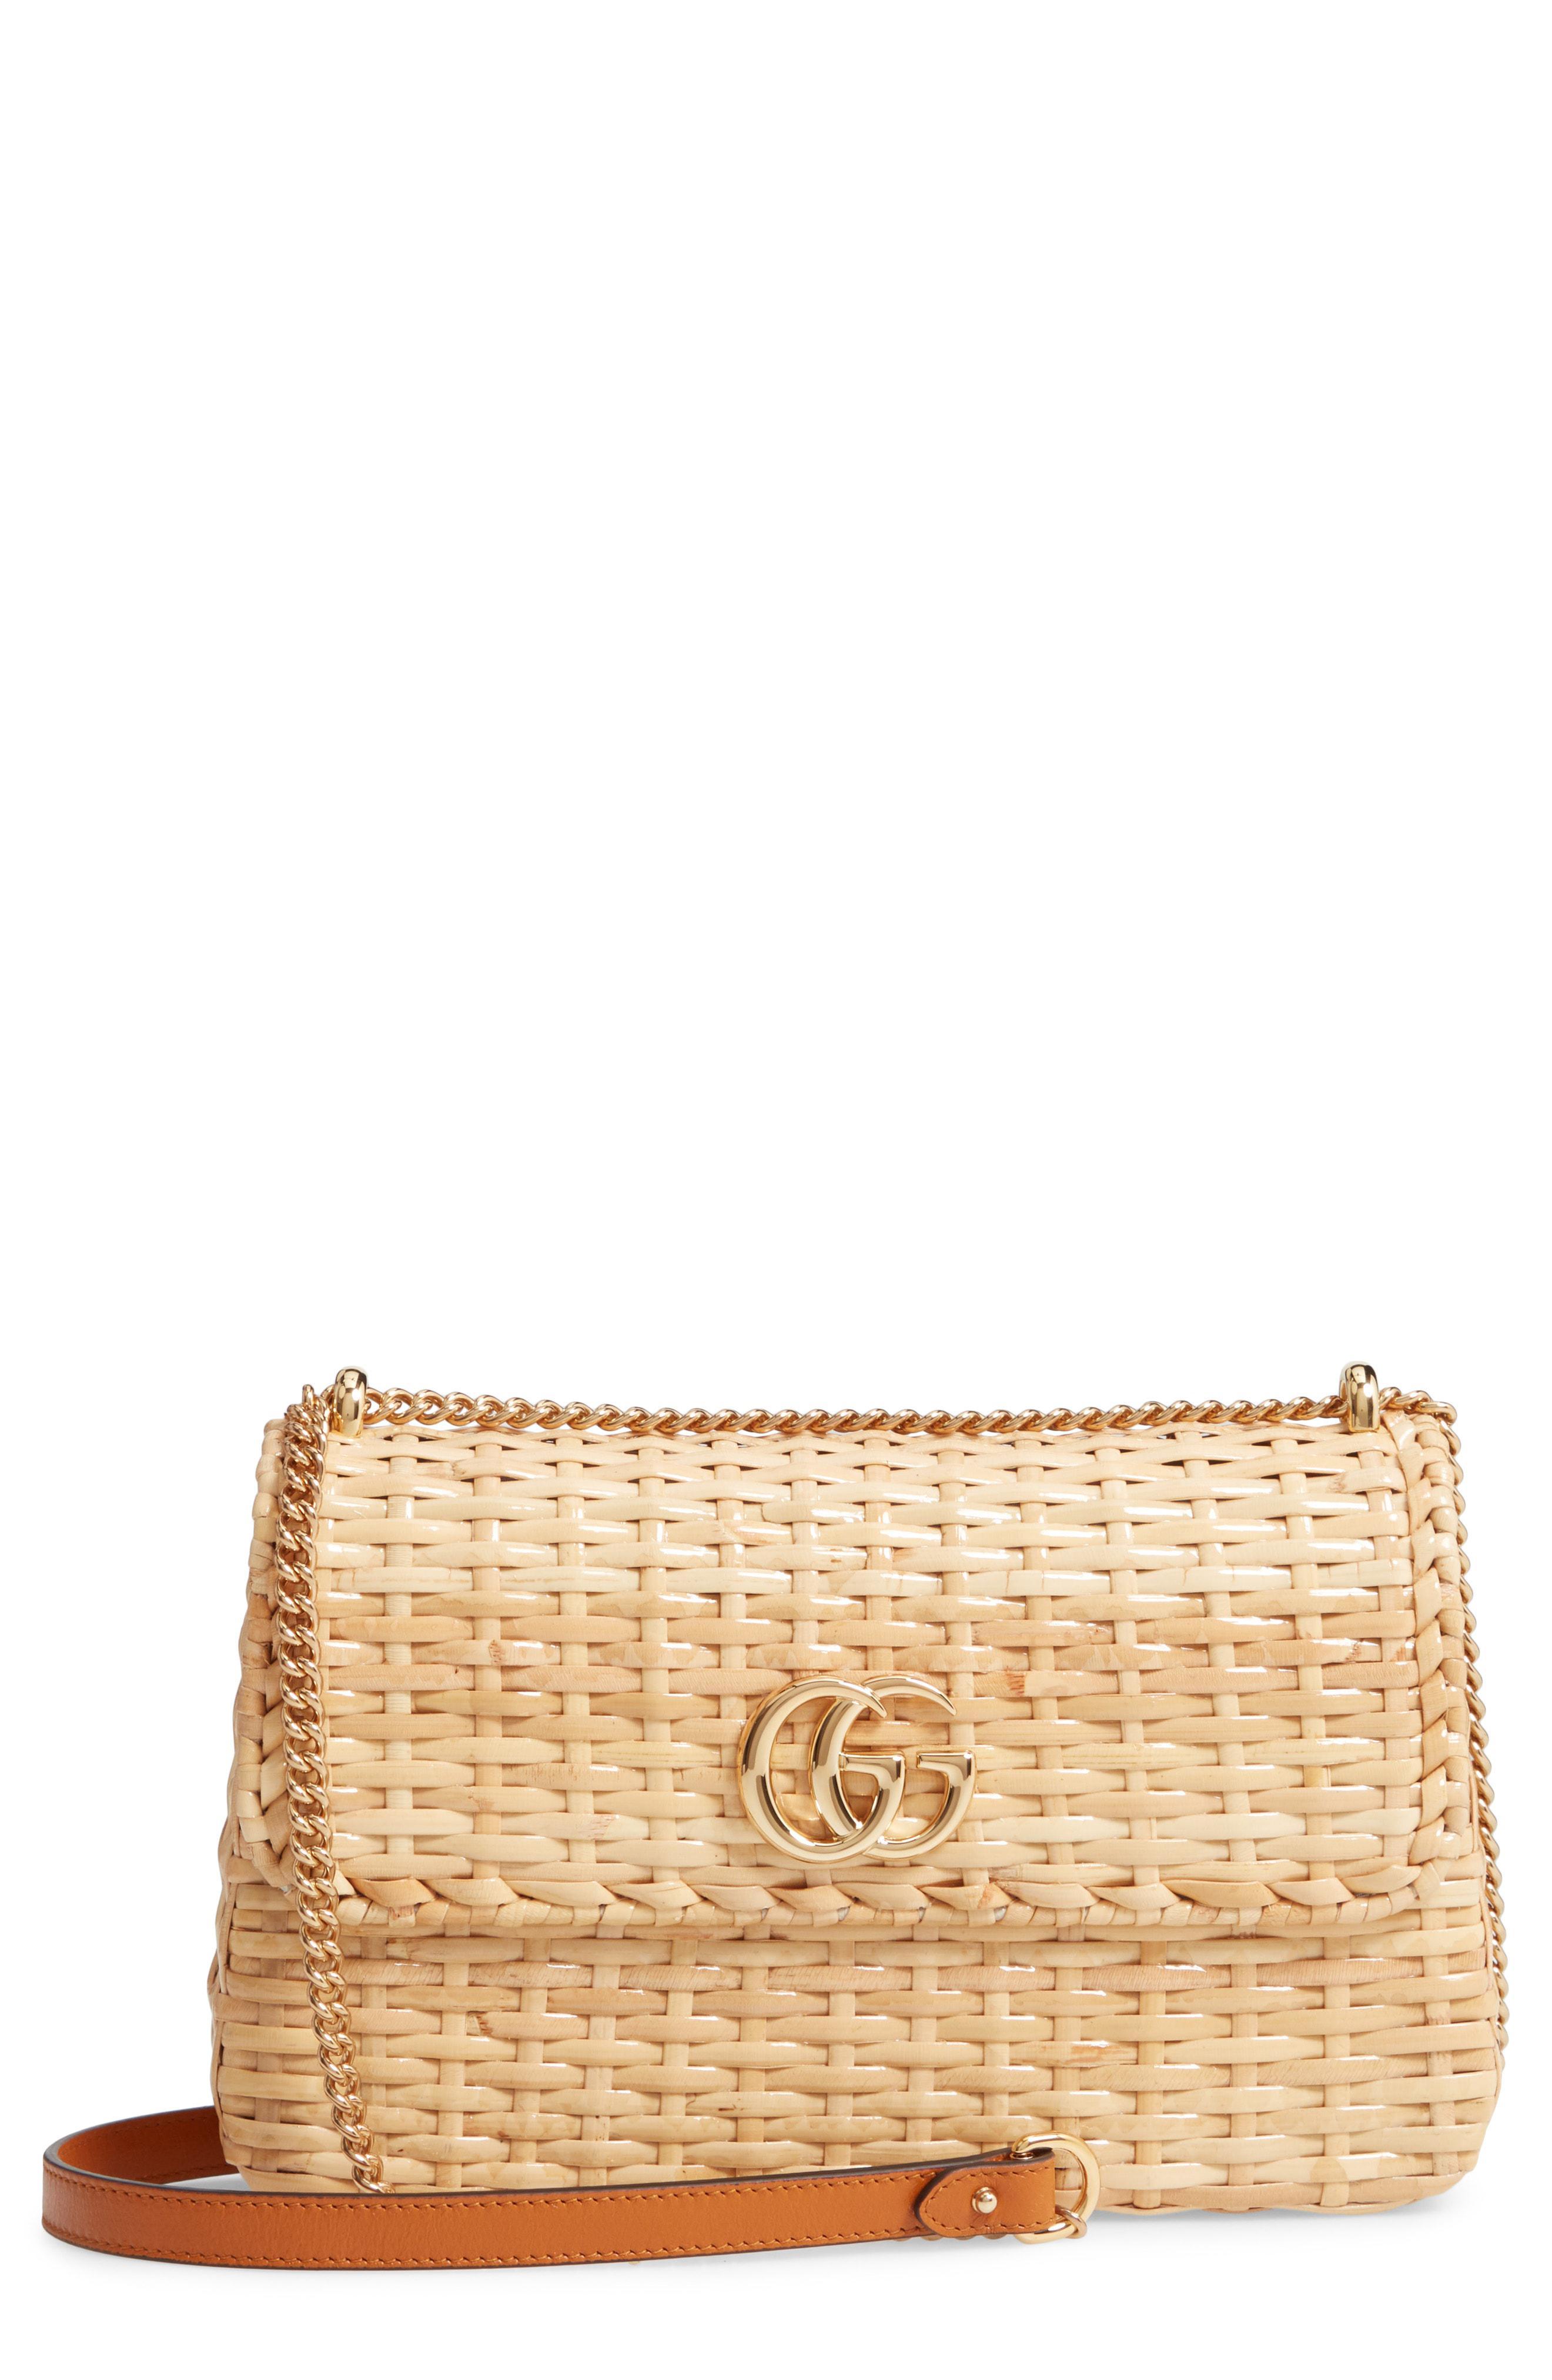 40a972cdd5ec Gucci Small Linea Cestino Glazed Wicker Shoulder Bag in Natural - Lyst